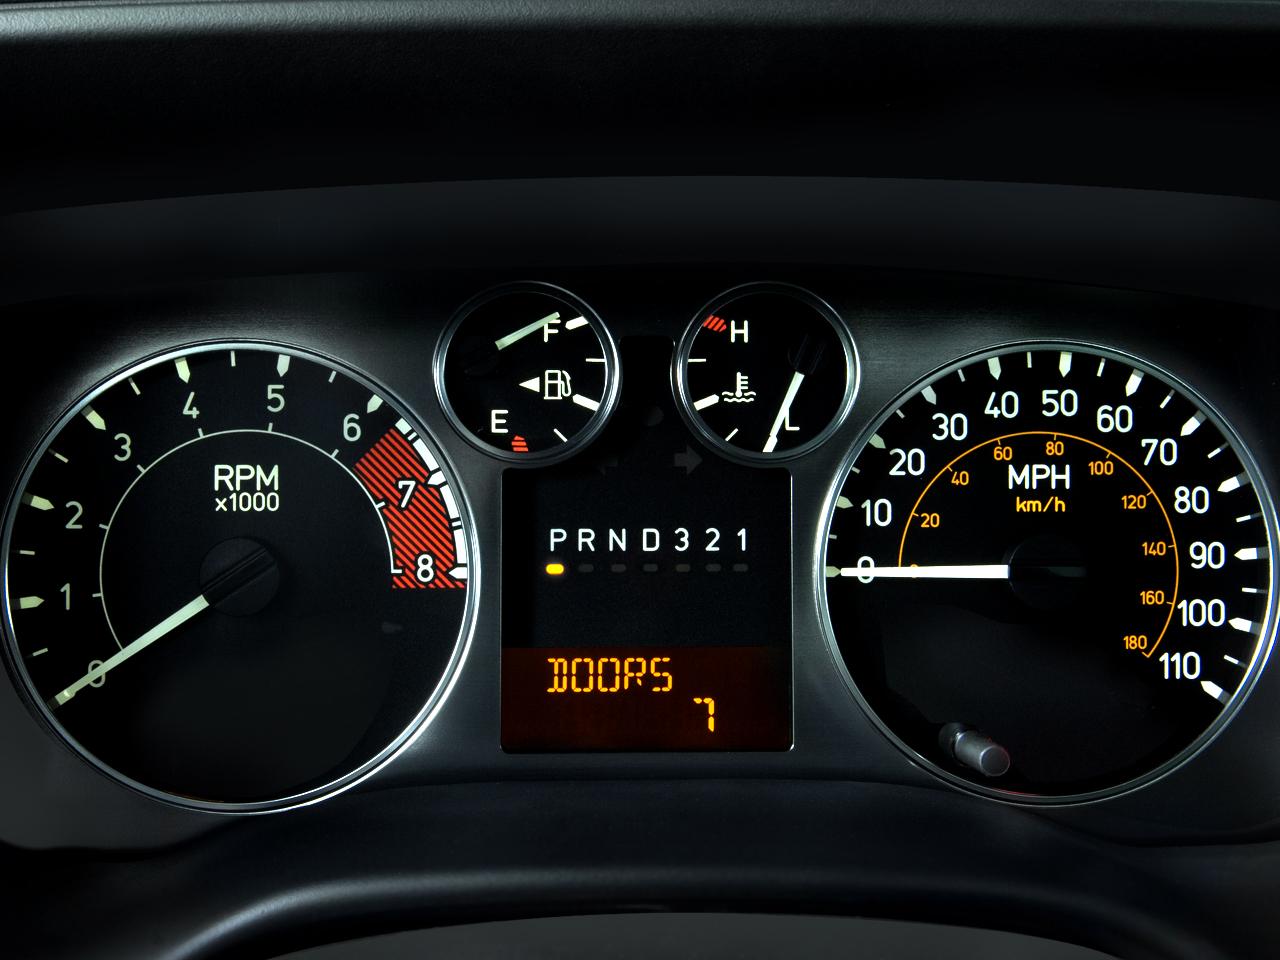 2008 Hummer H3 Alpha New And Future Car Reviews Automobile Magazine